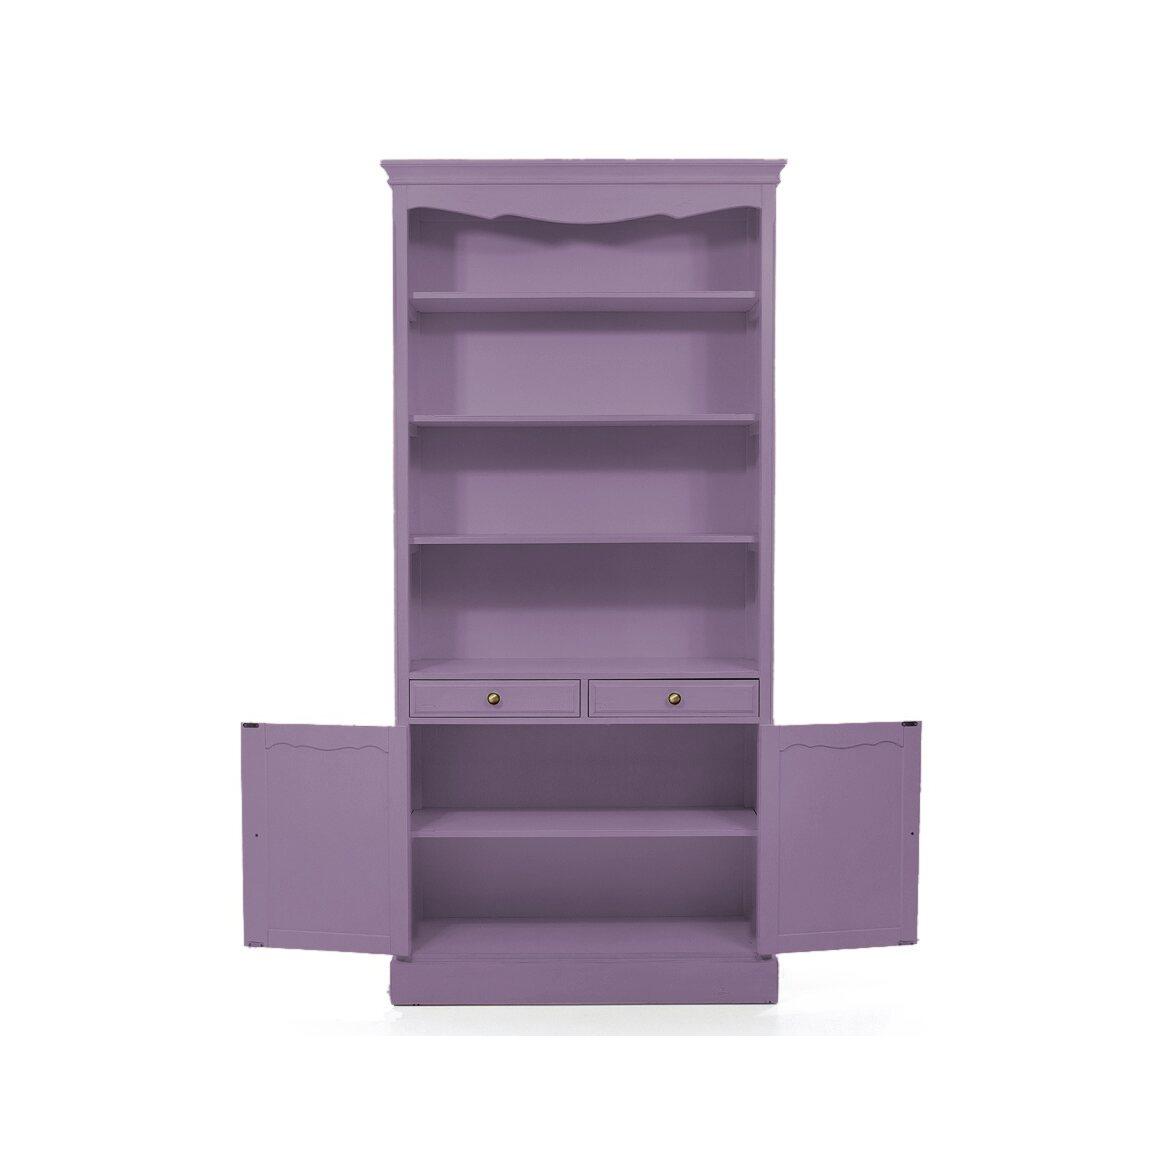 Стеллаж с 2-я ящиками Leontina, лавандового цвета 2 | Стеллажи Kingsby